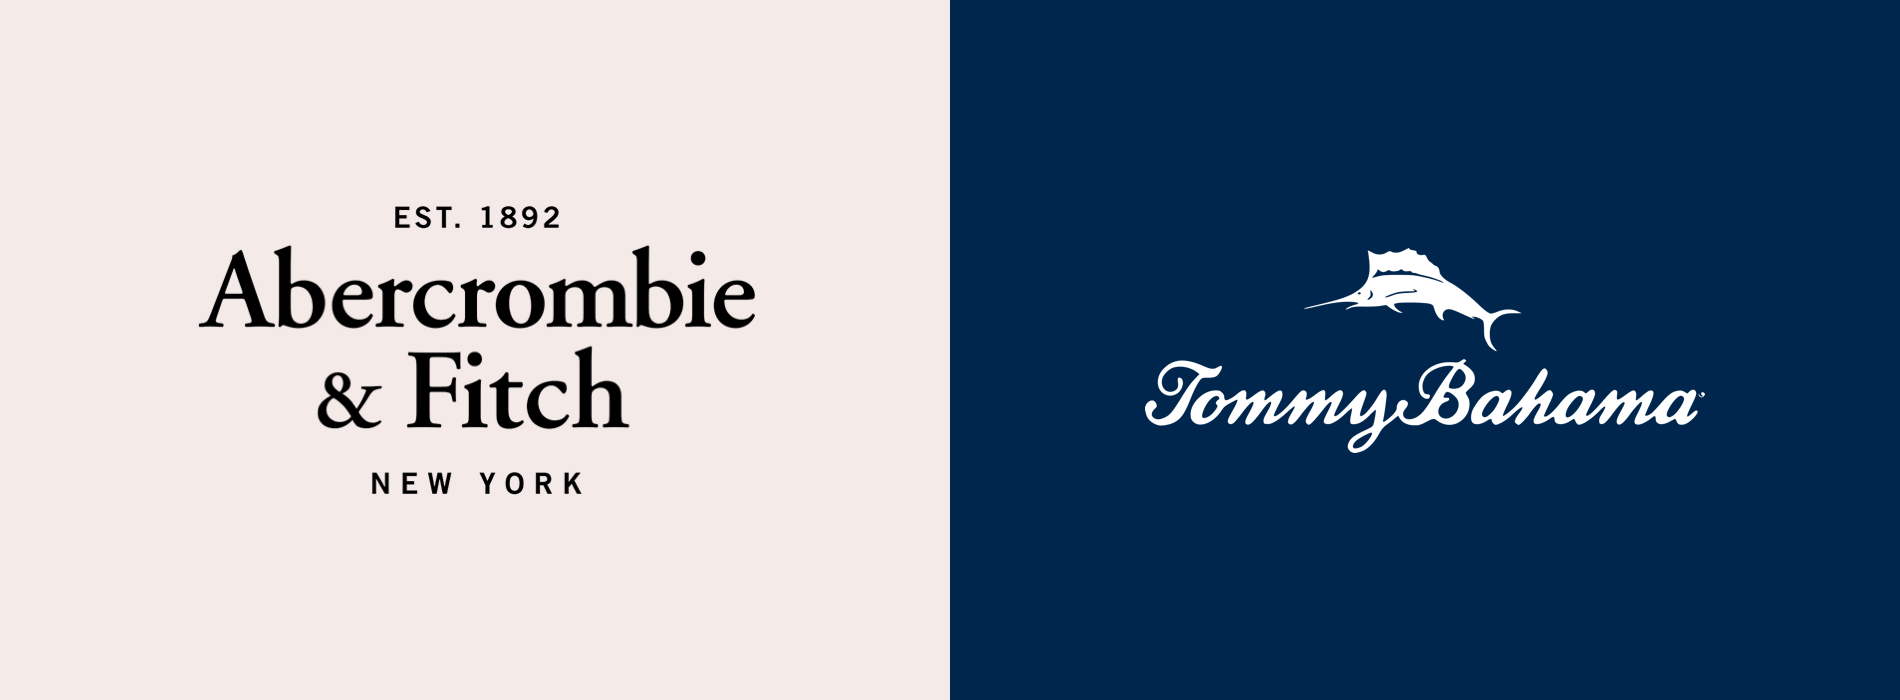 Abercrombie & Fitch vs Tommy Bahama: a UX Comparison